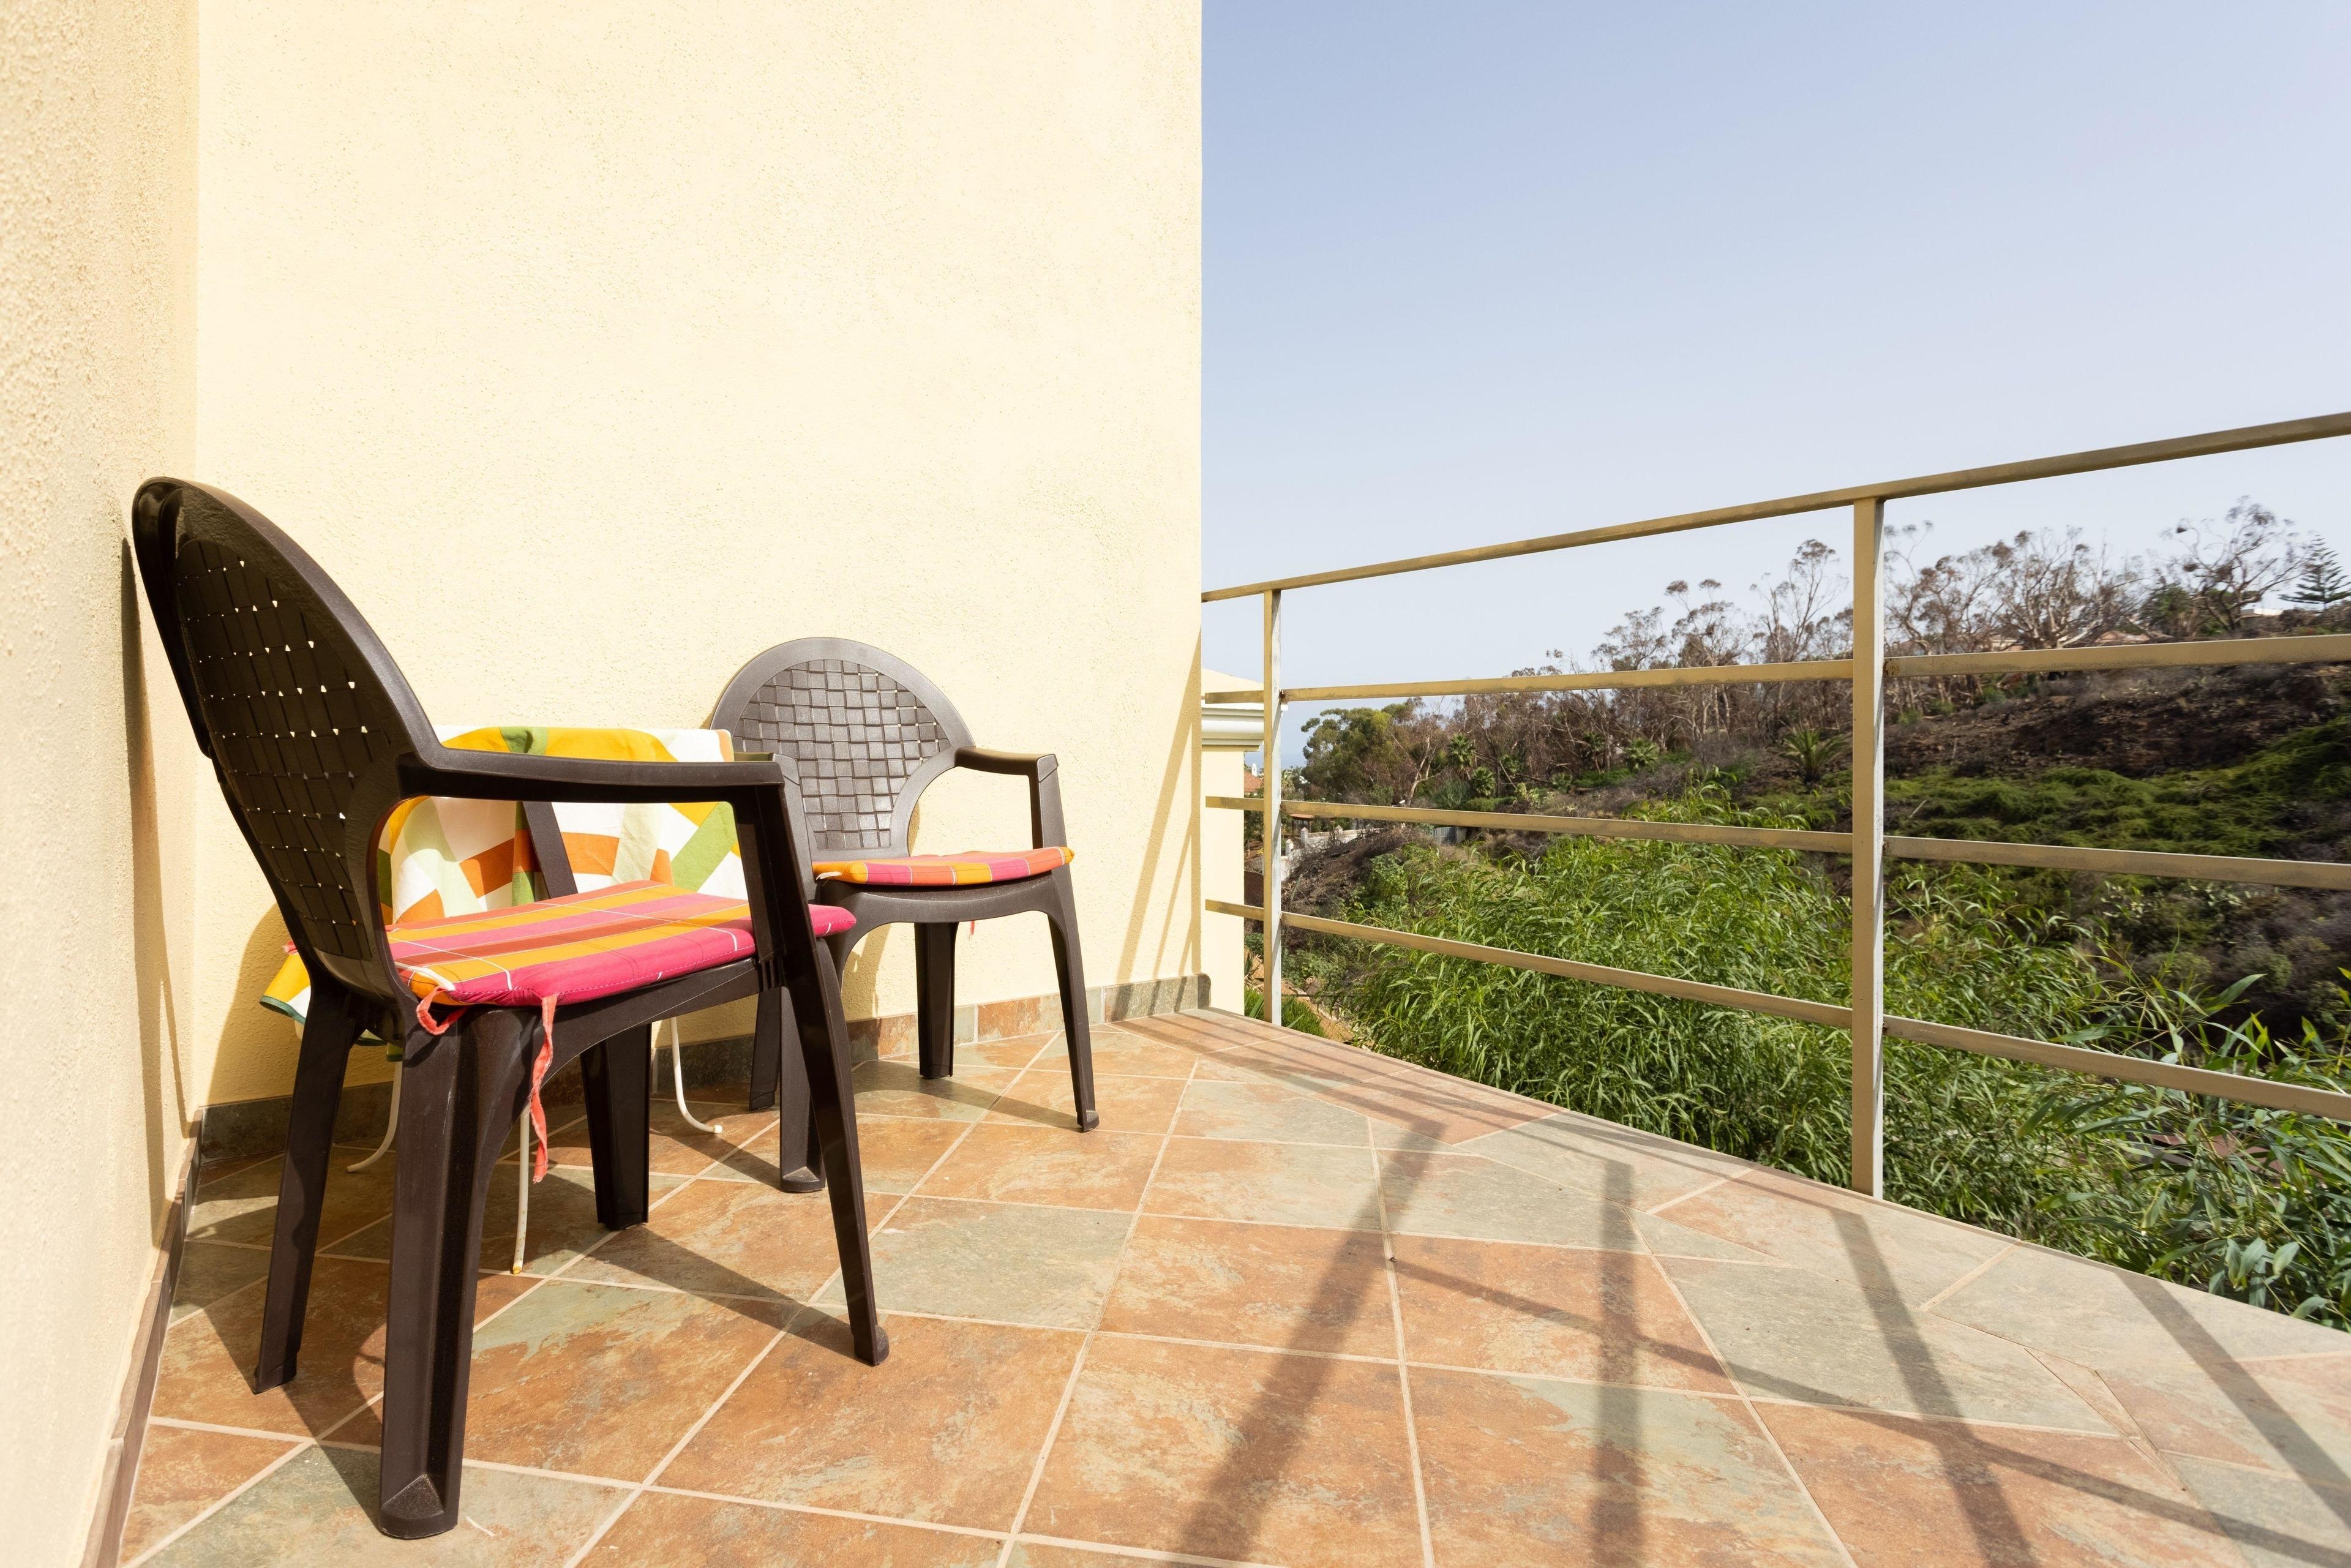 Appartement de vacances Fewo Atico Florasol, sehr ruhig direkt am Naturschutzgebiet, mit Pool, 2 Terrassen, Grill, (2492983), Santa Ursula, Ténérife, Iles Canaries, Espagne, image 14